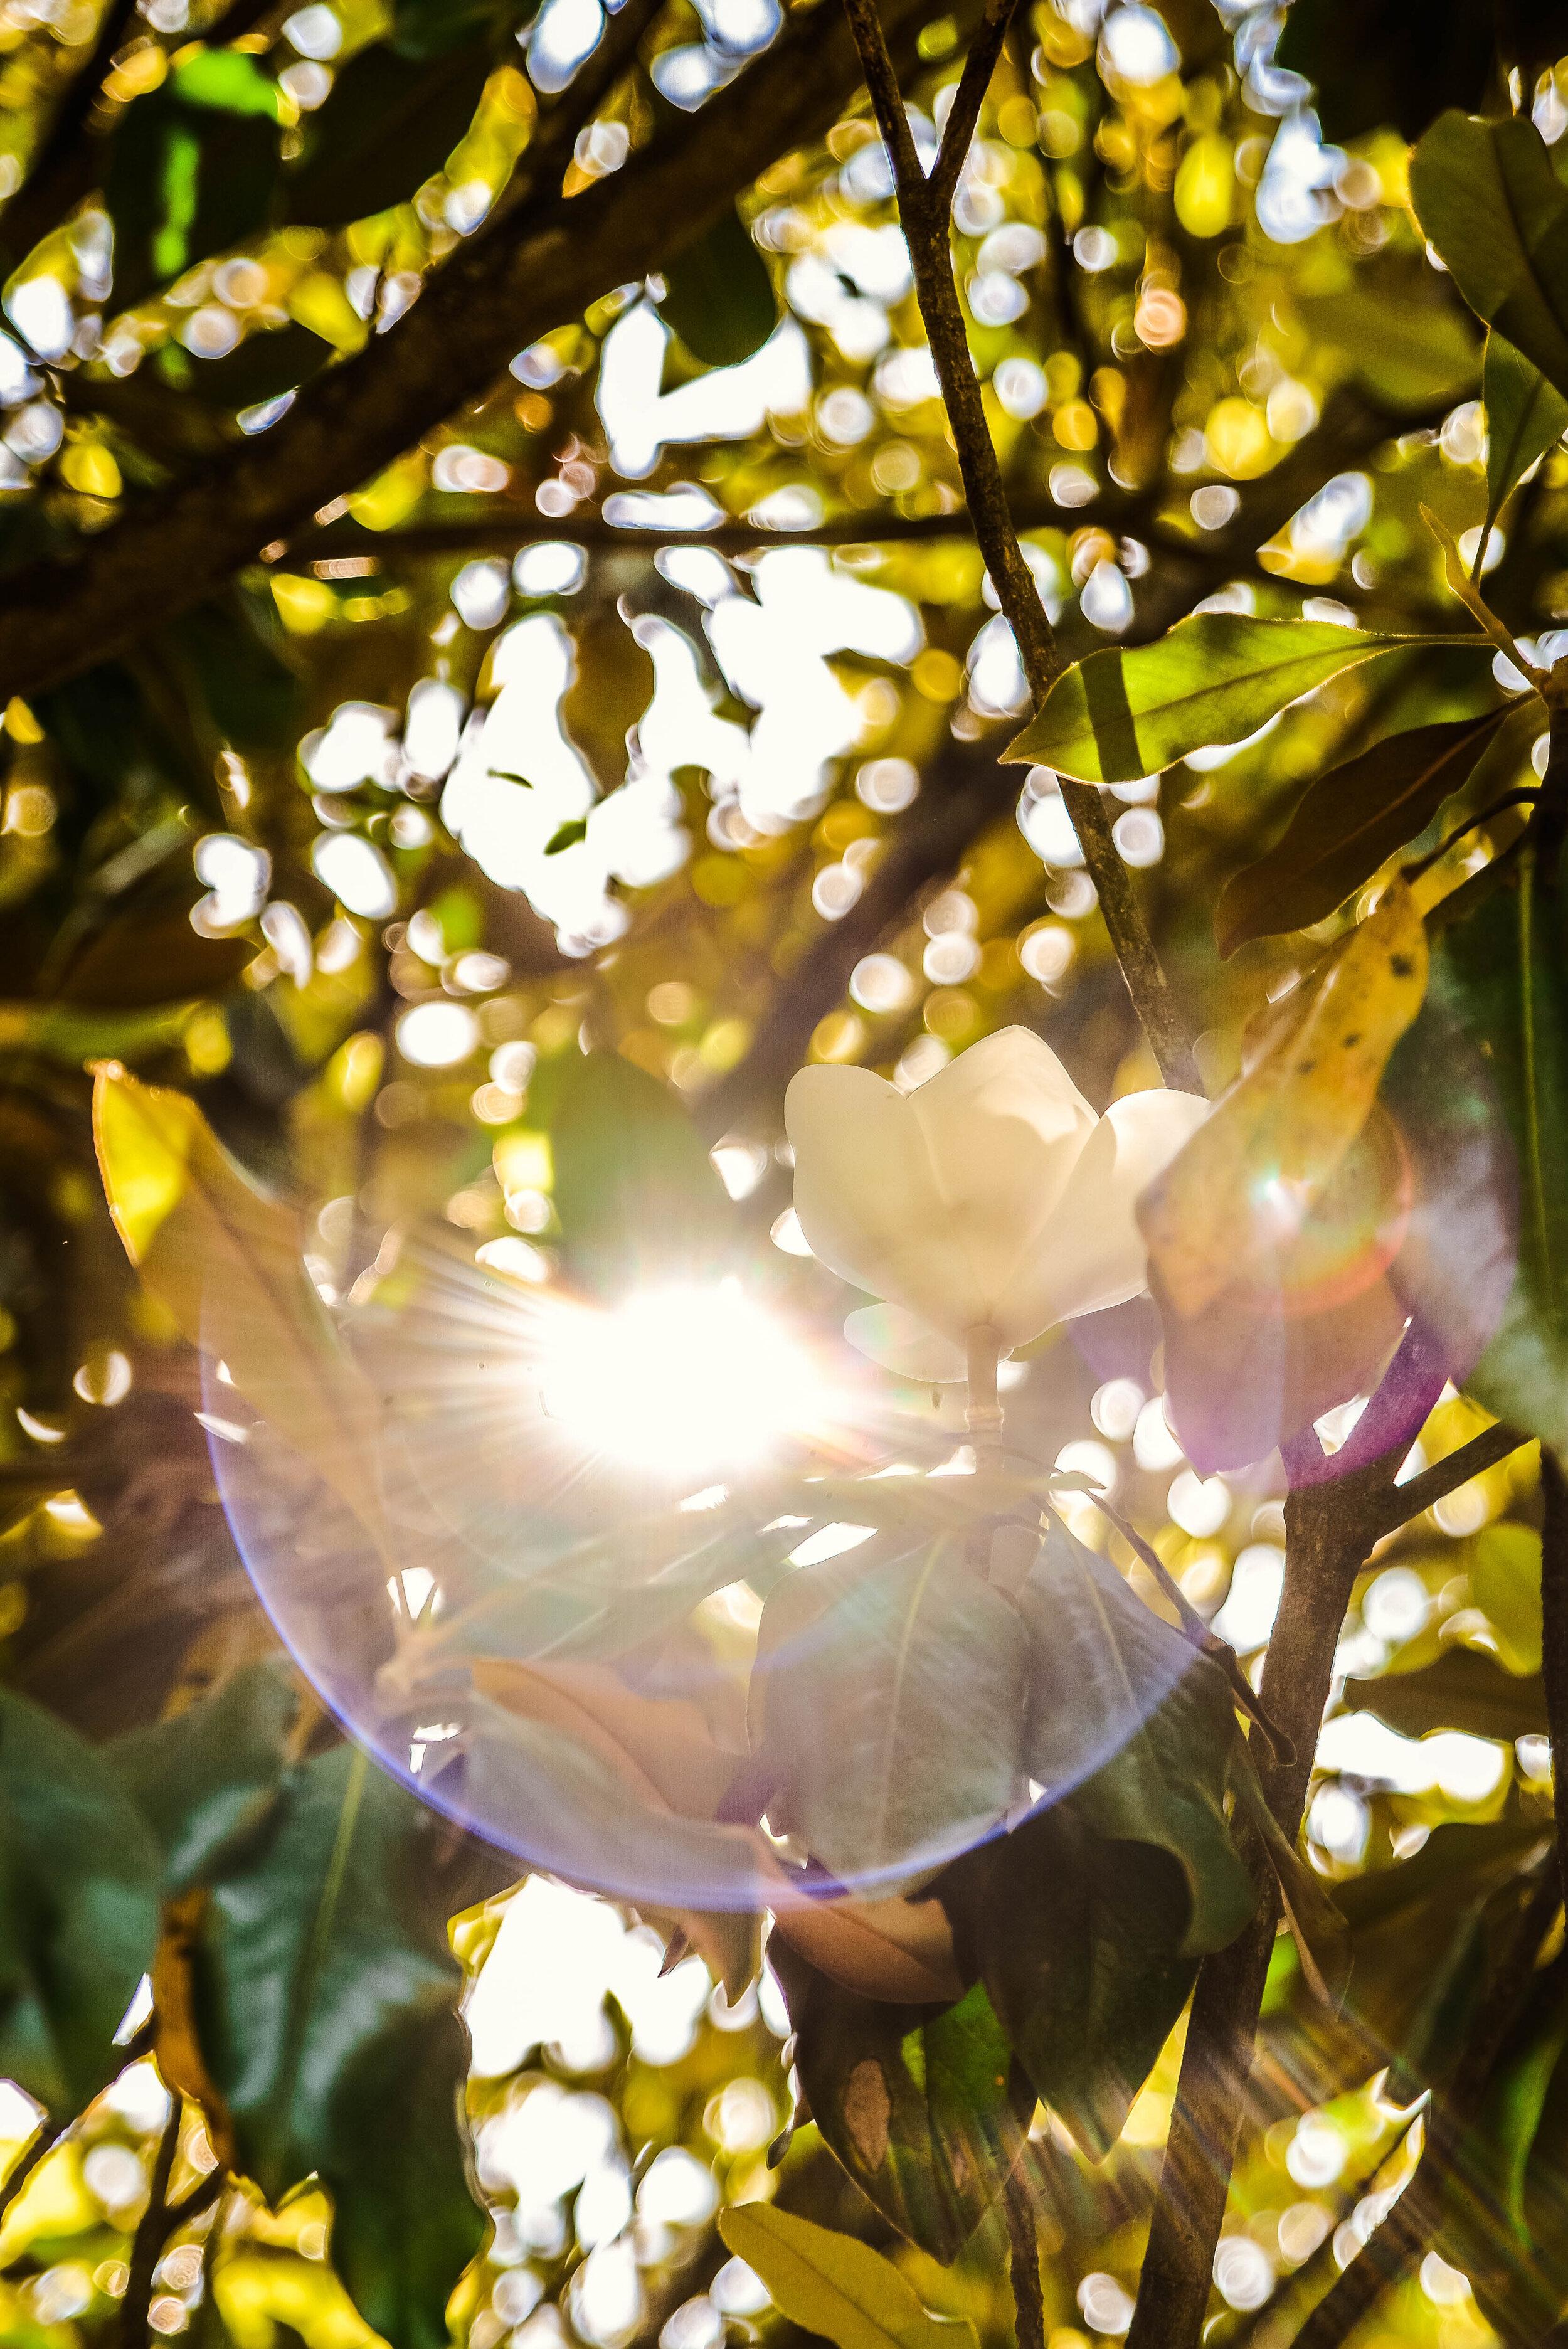 Freight Farms_Indoor Grow Lights vs Sunlight